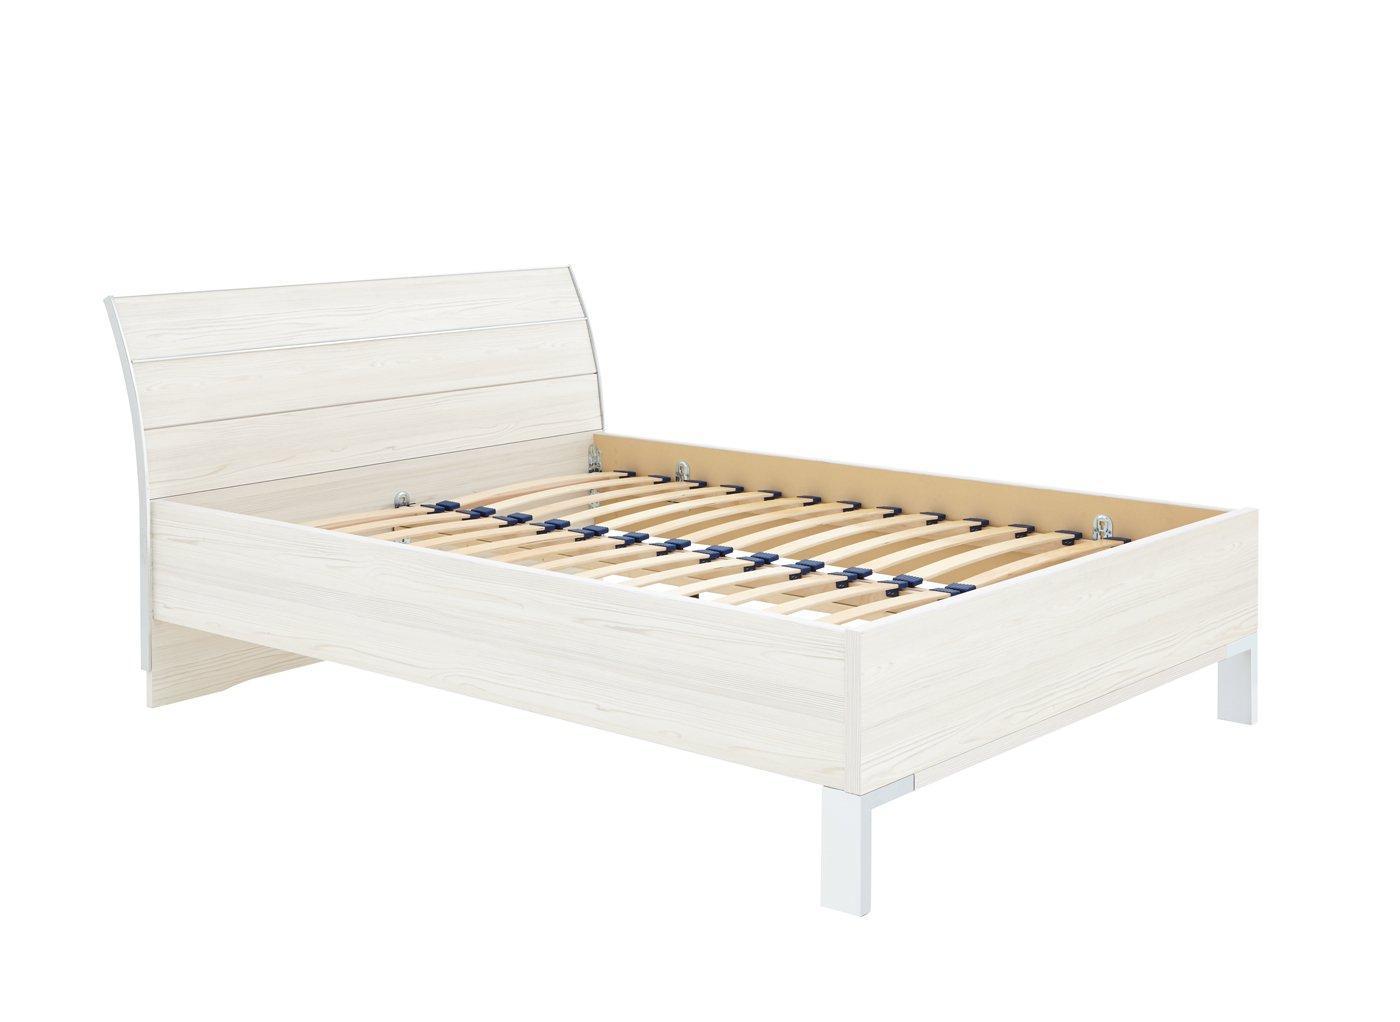 fiji-bed-frame